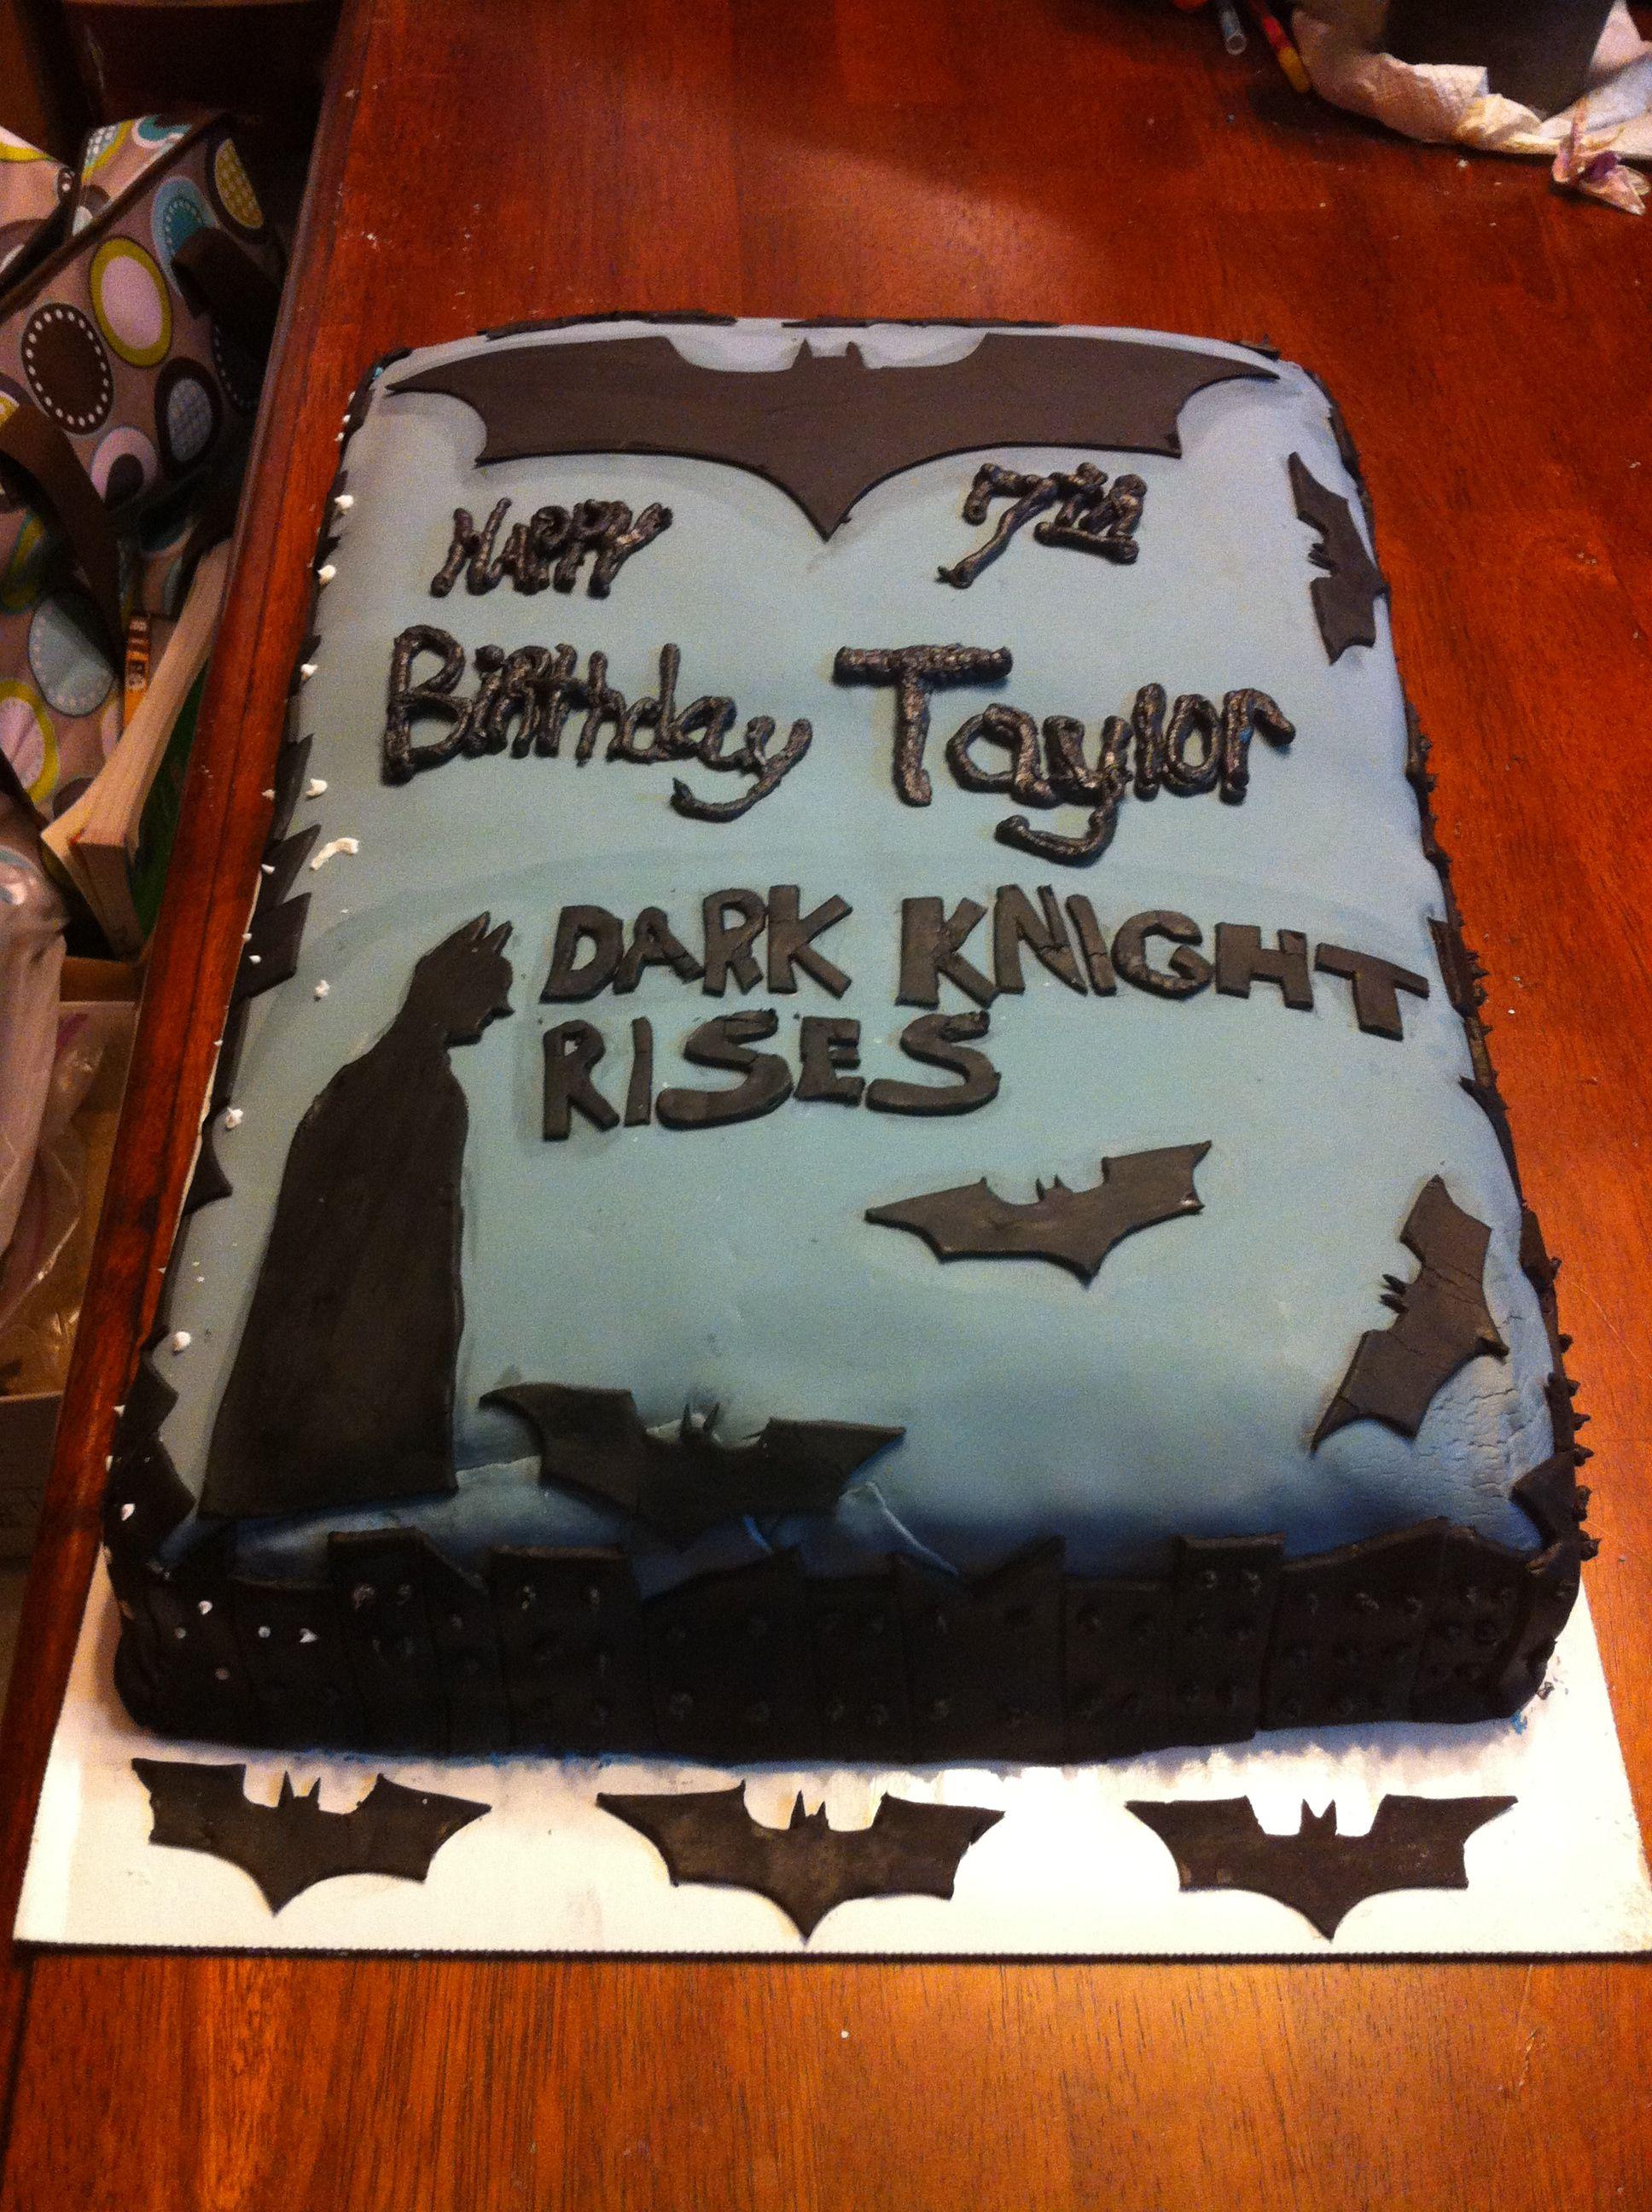 Dark Knight Rises Cake Turtle Kakes Pinterest Cake - Dark knight birthday cake